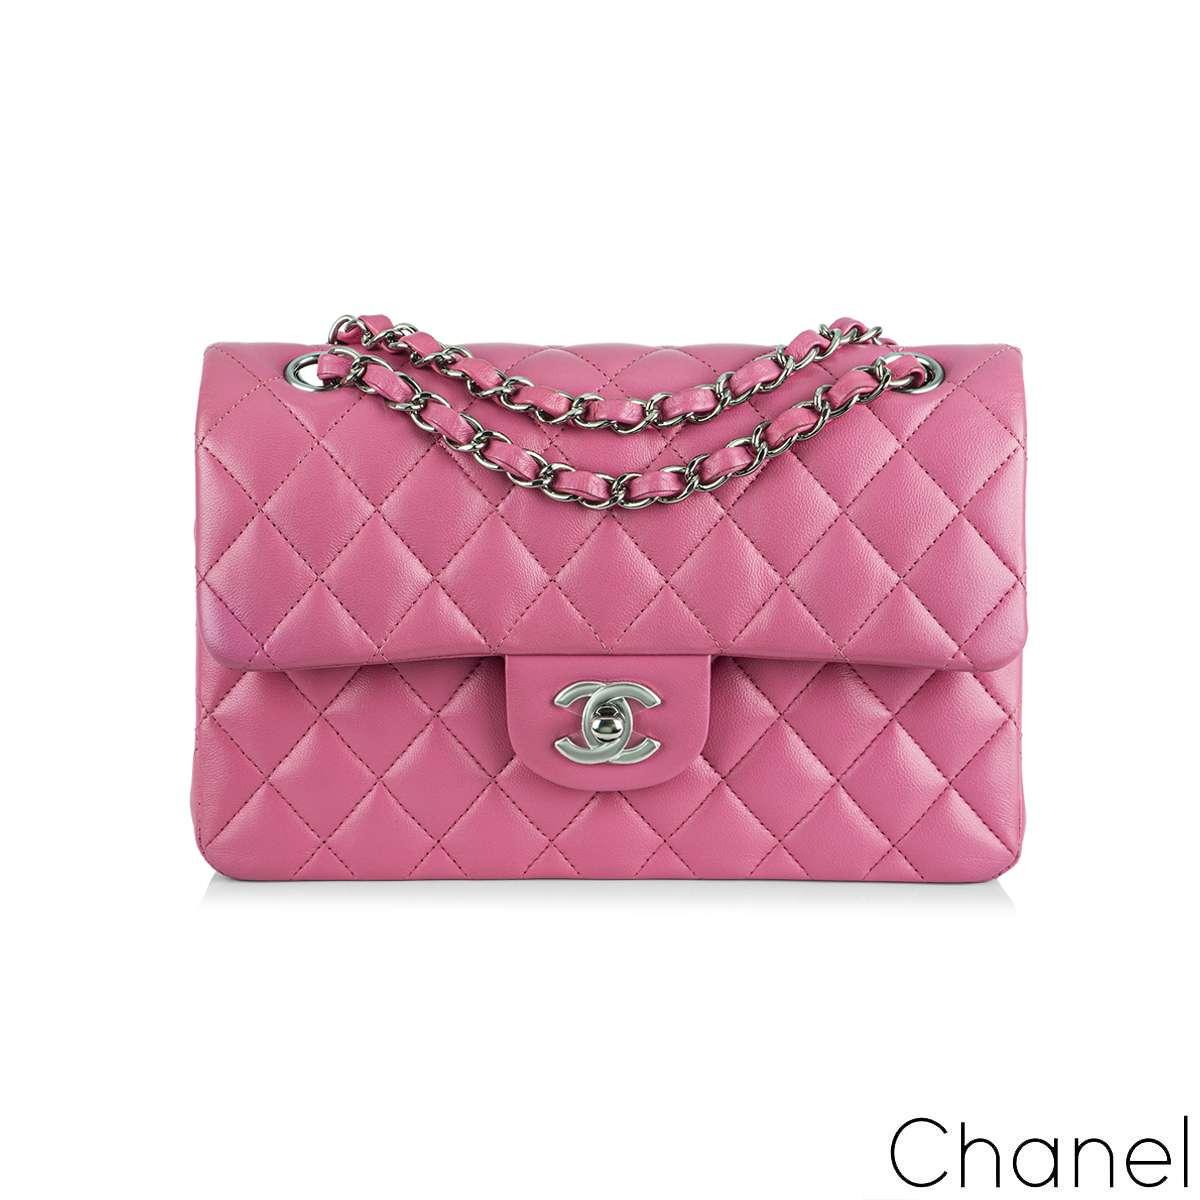 Chanel Fuchsia Pink Lambskin Classic Small Flap Bag